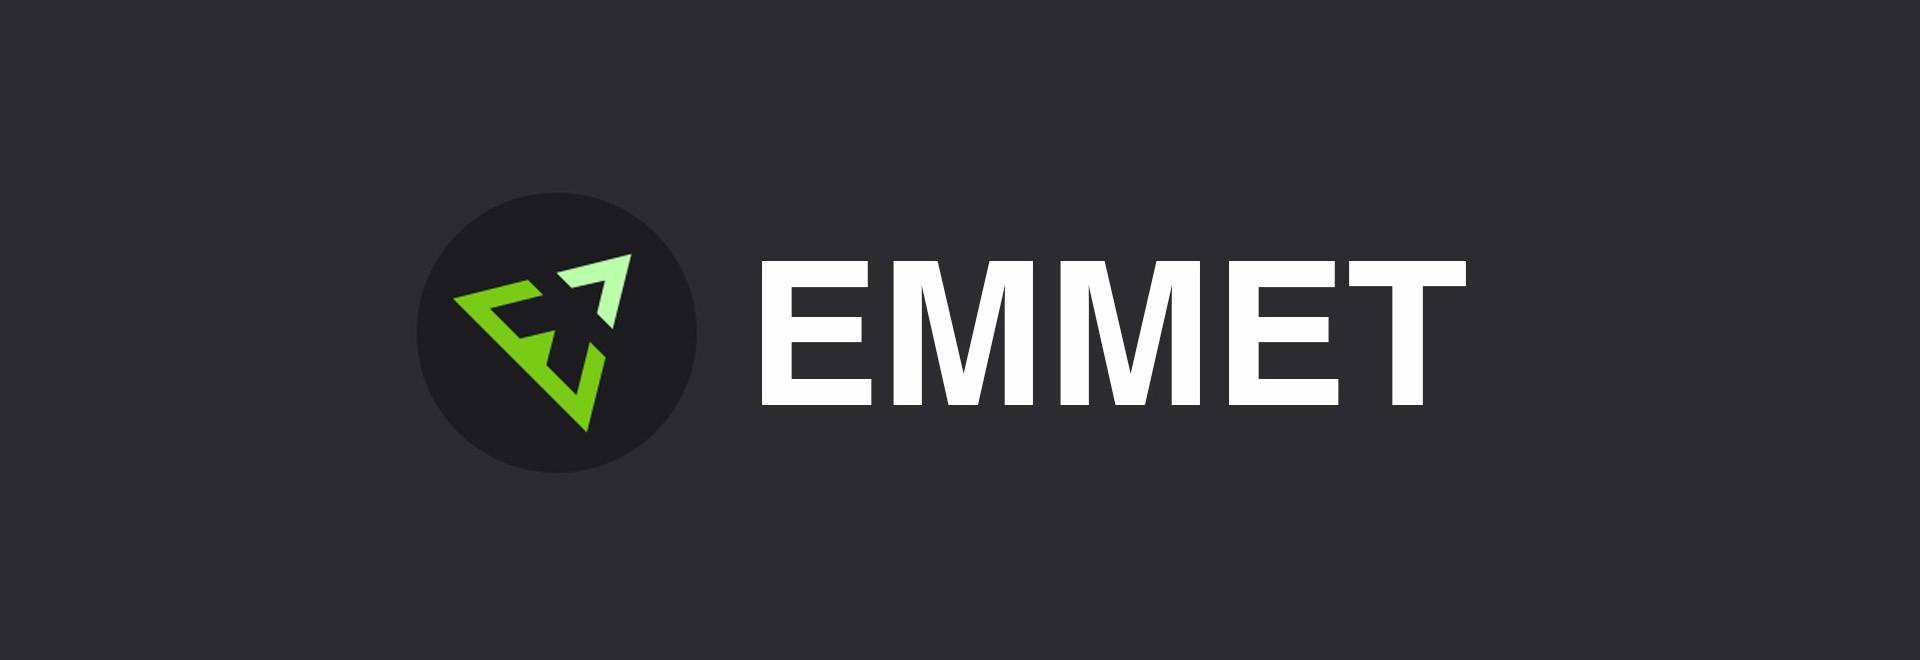 Emmet Logo Hero Image